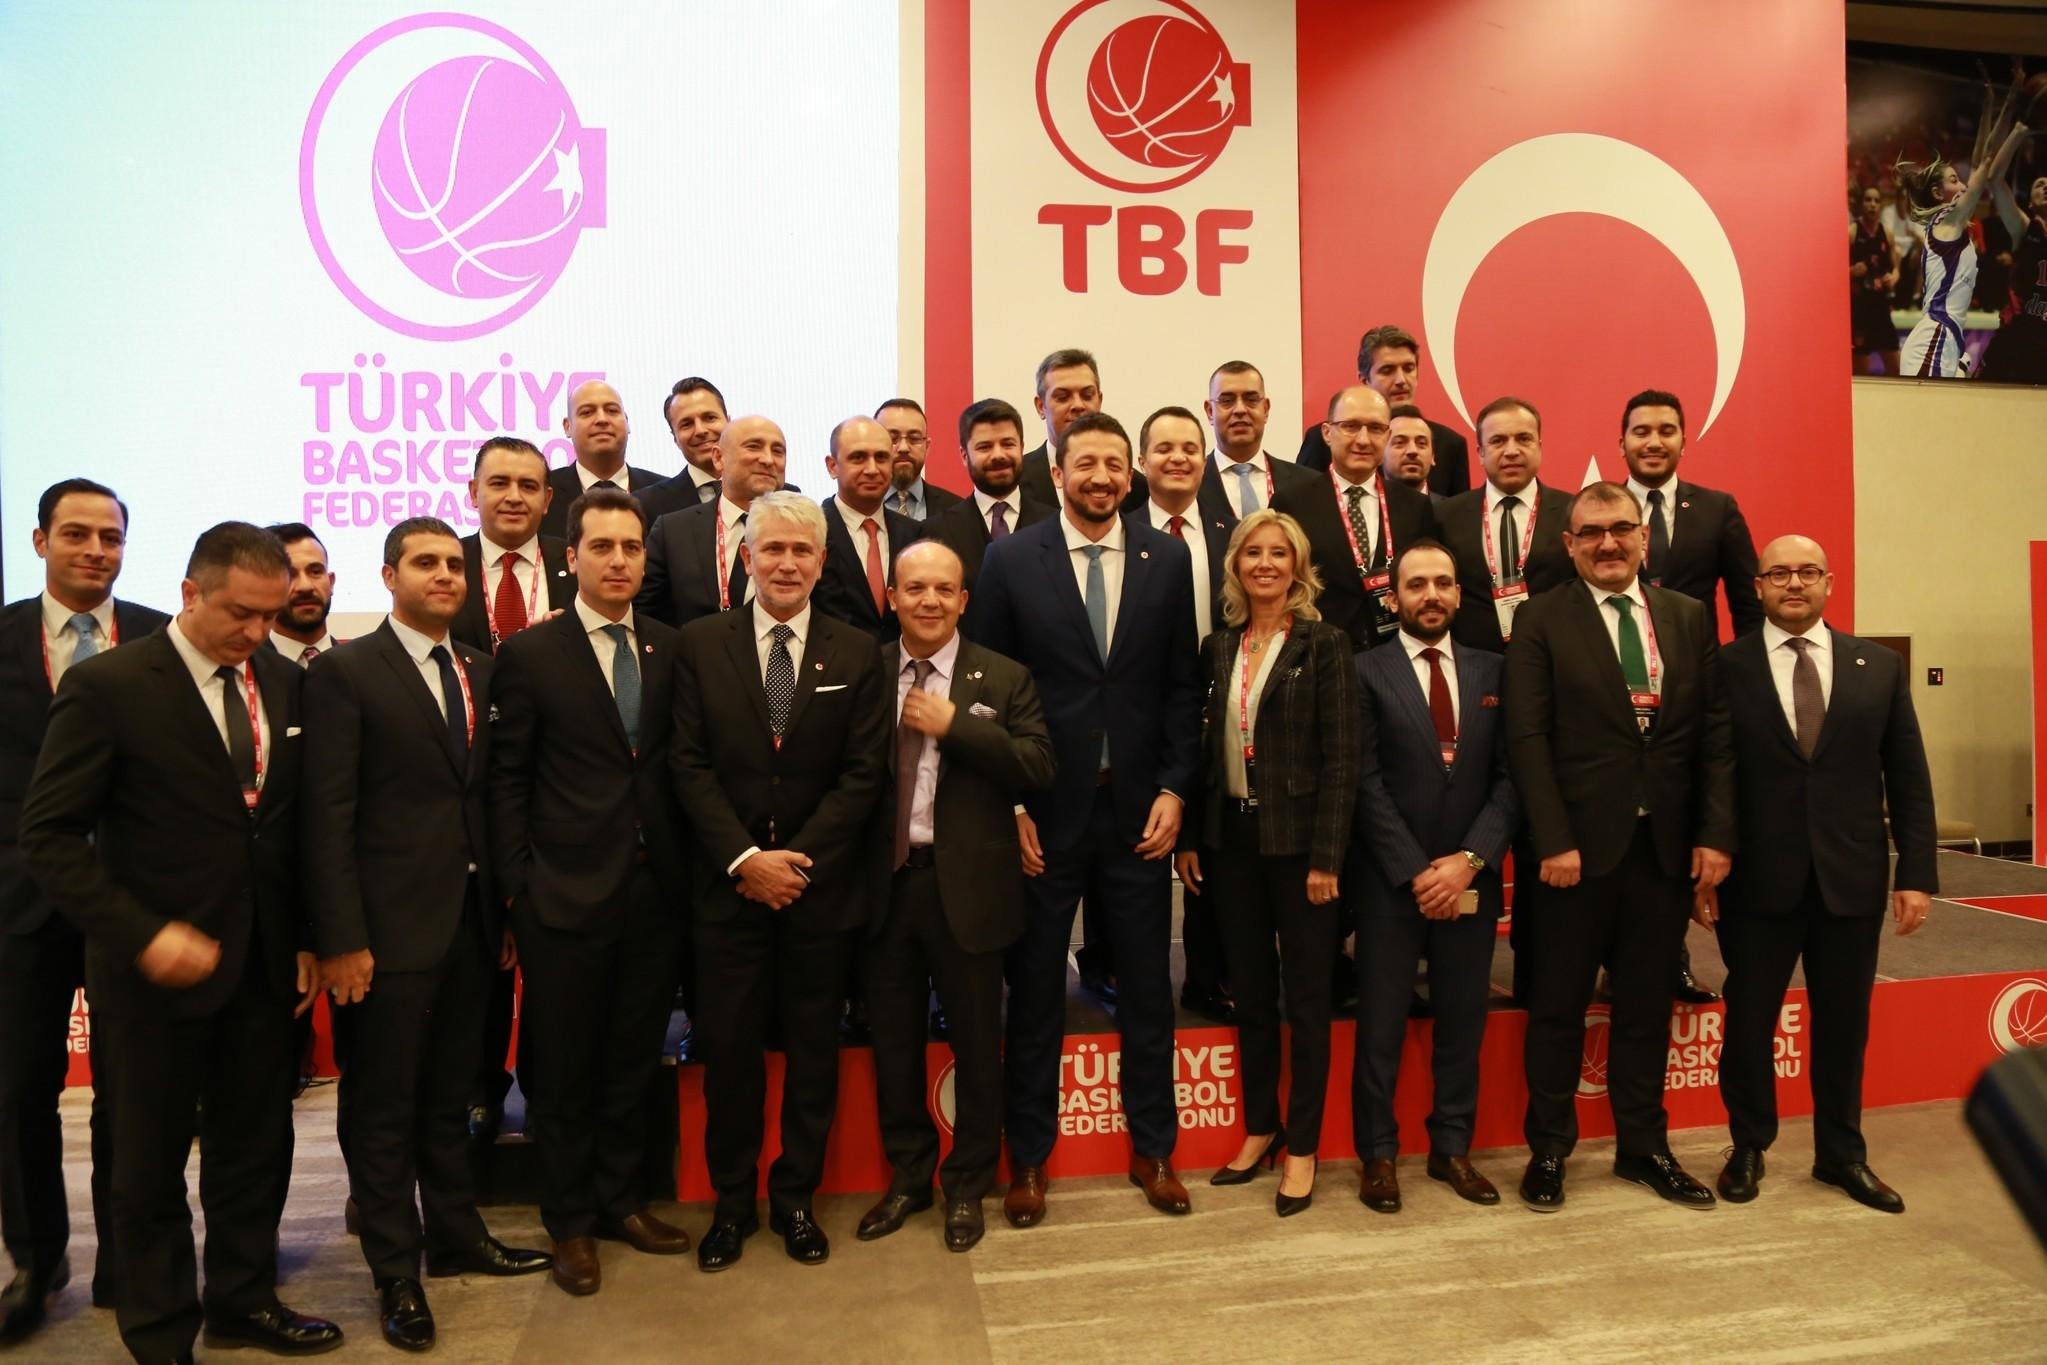 Hidayet Hedo Türkoğlu elected as new president of Turkish